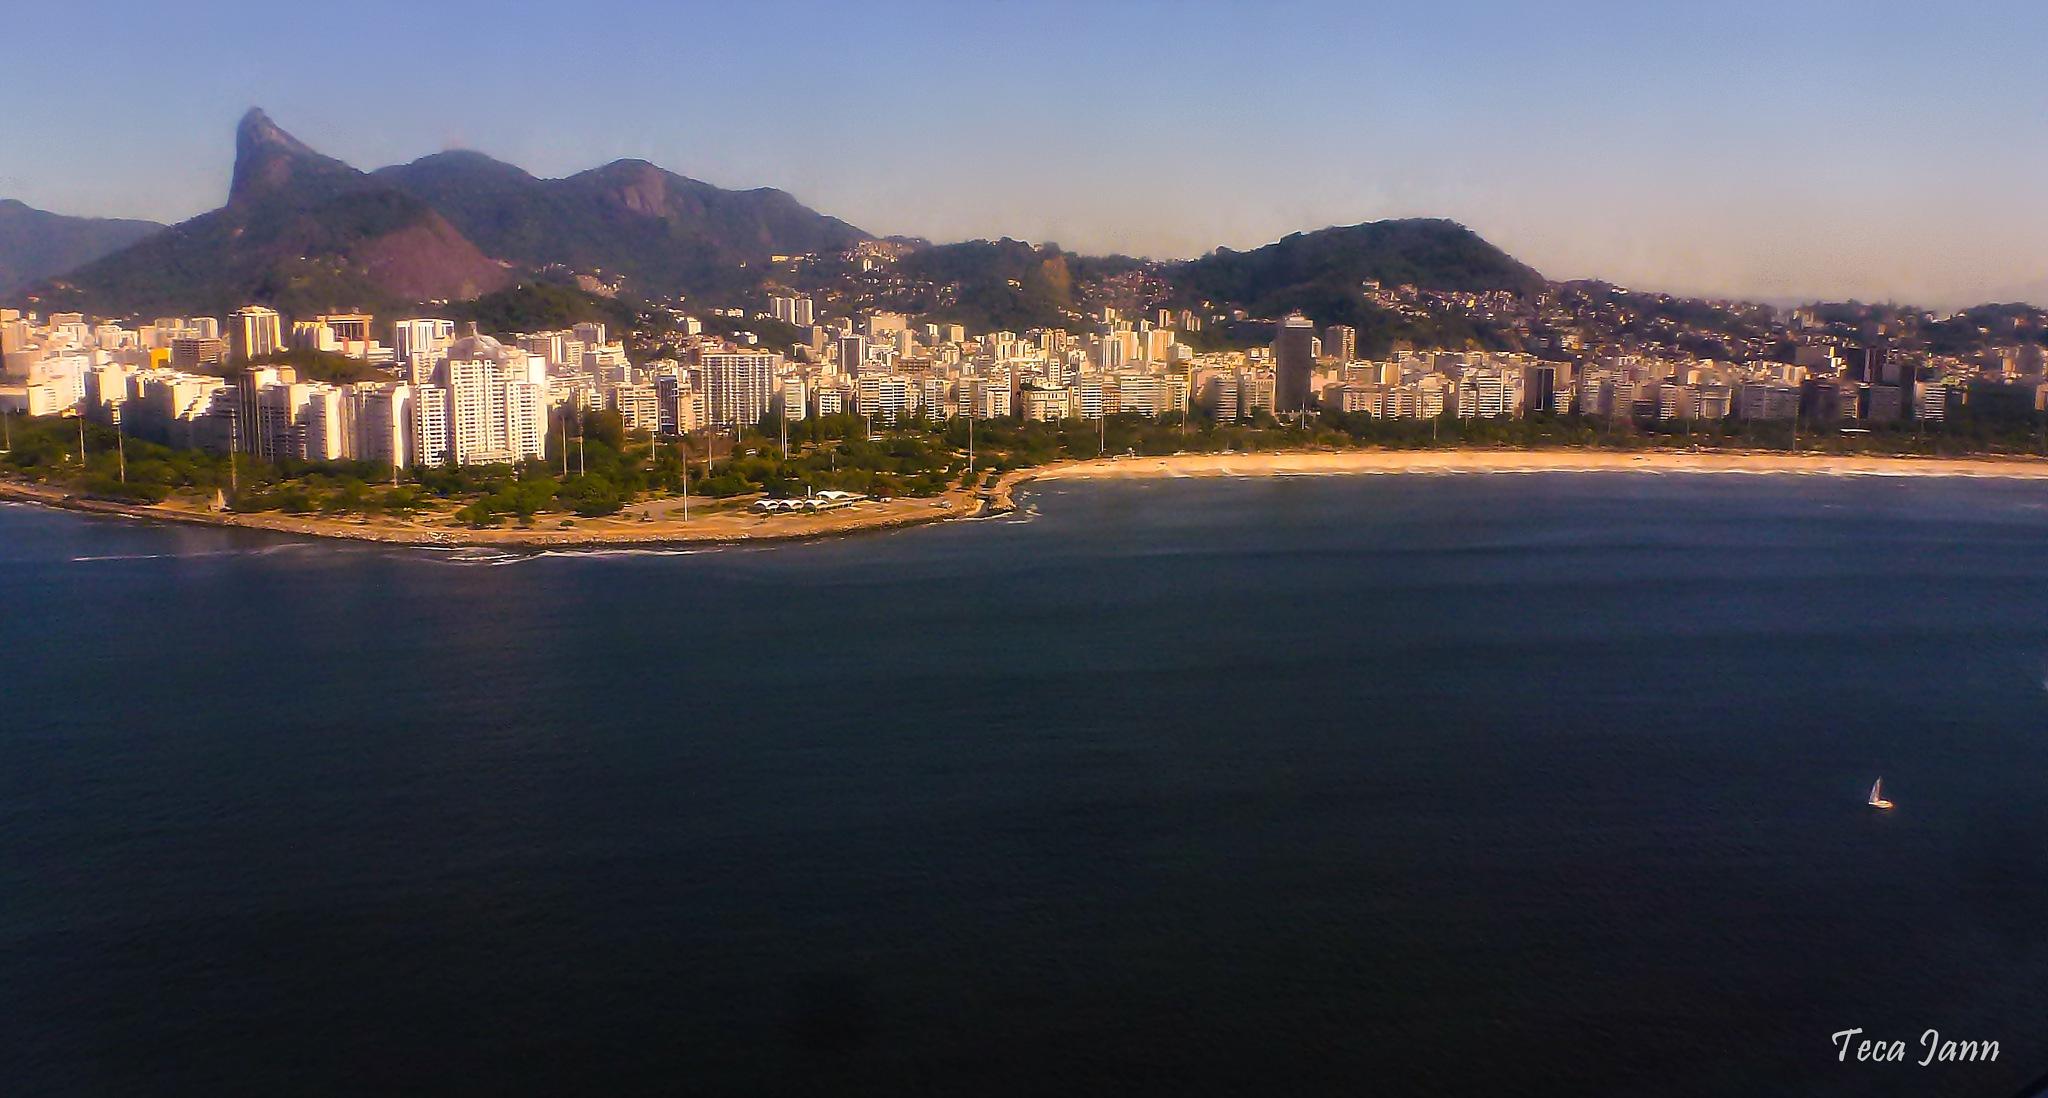 Rio de Janeiro by tecajanone